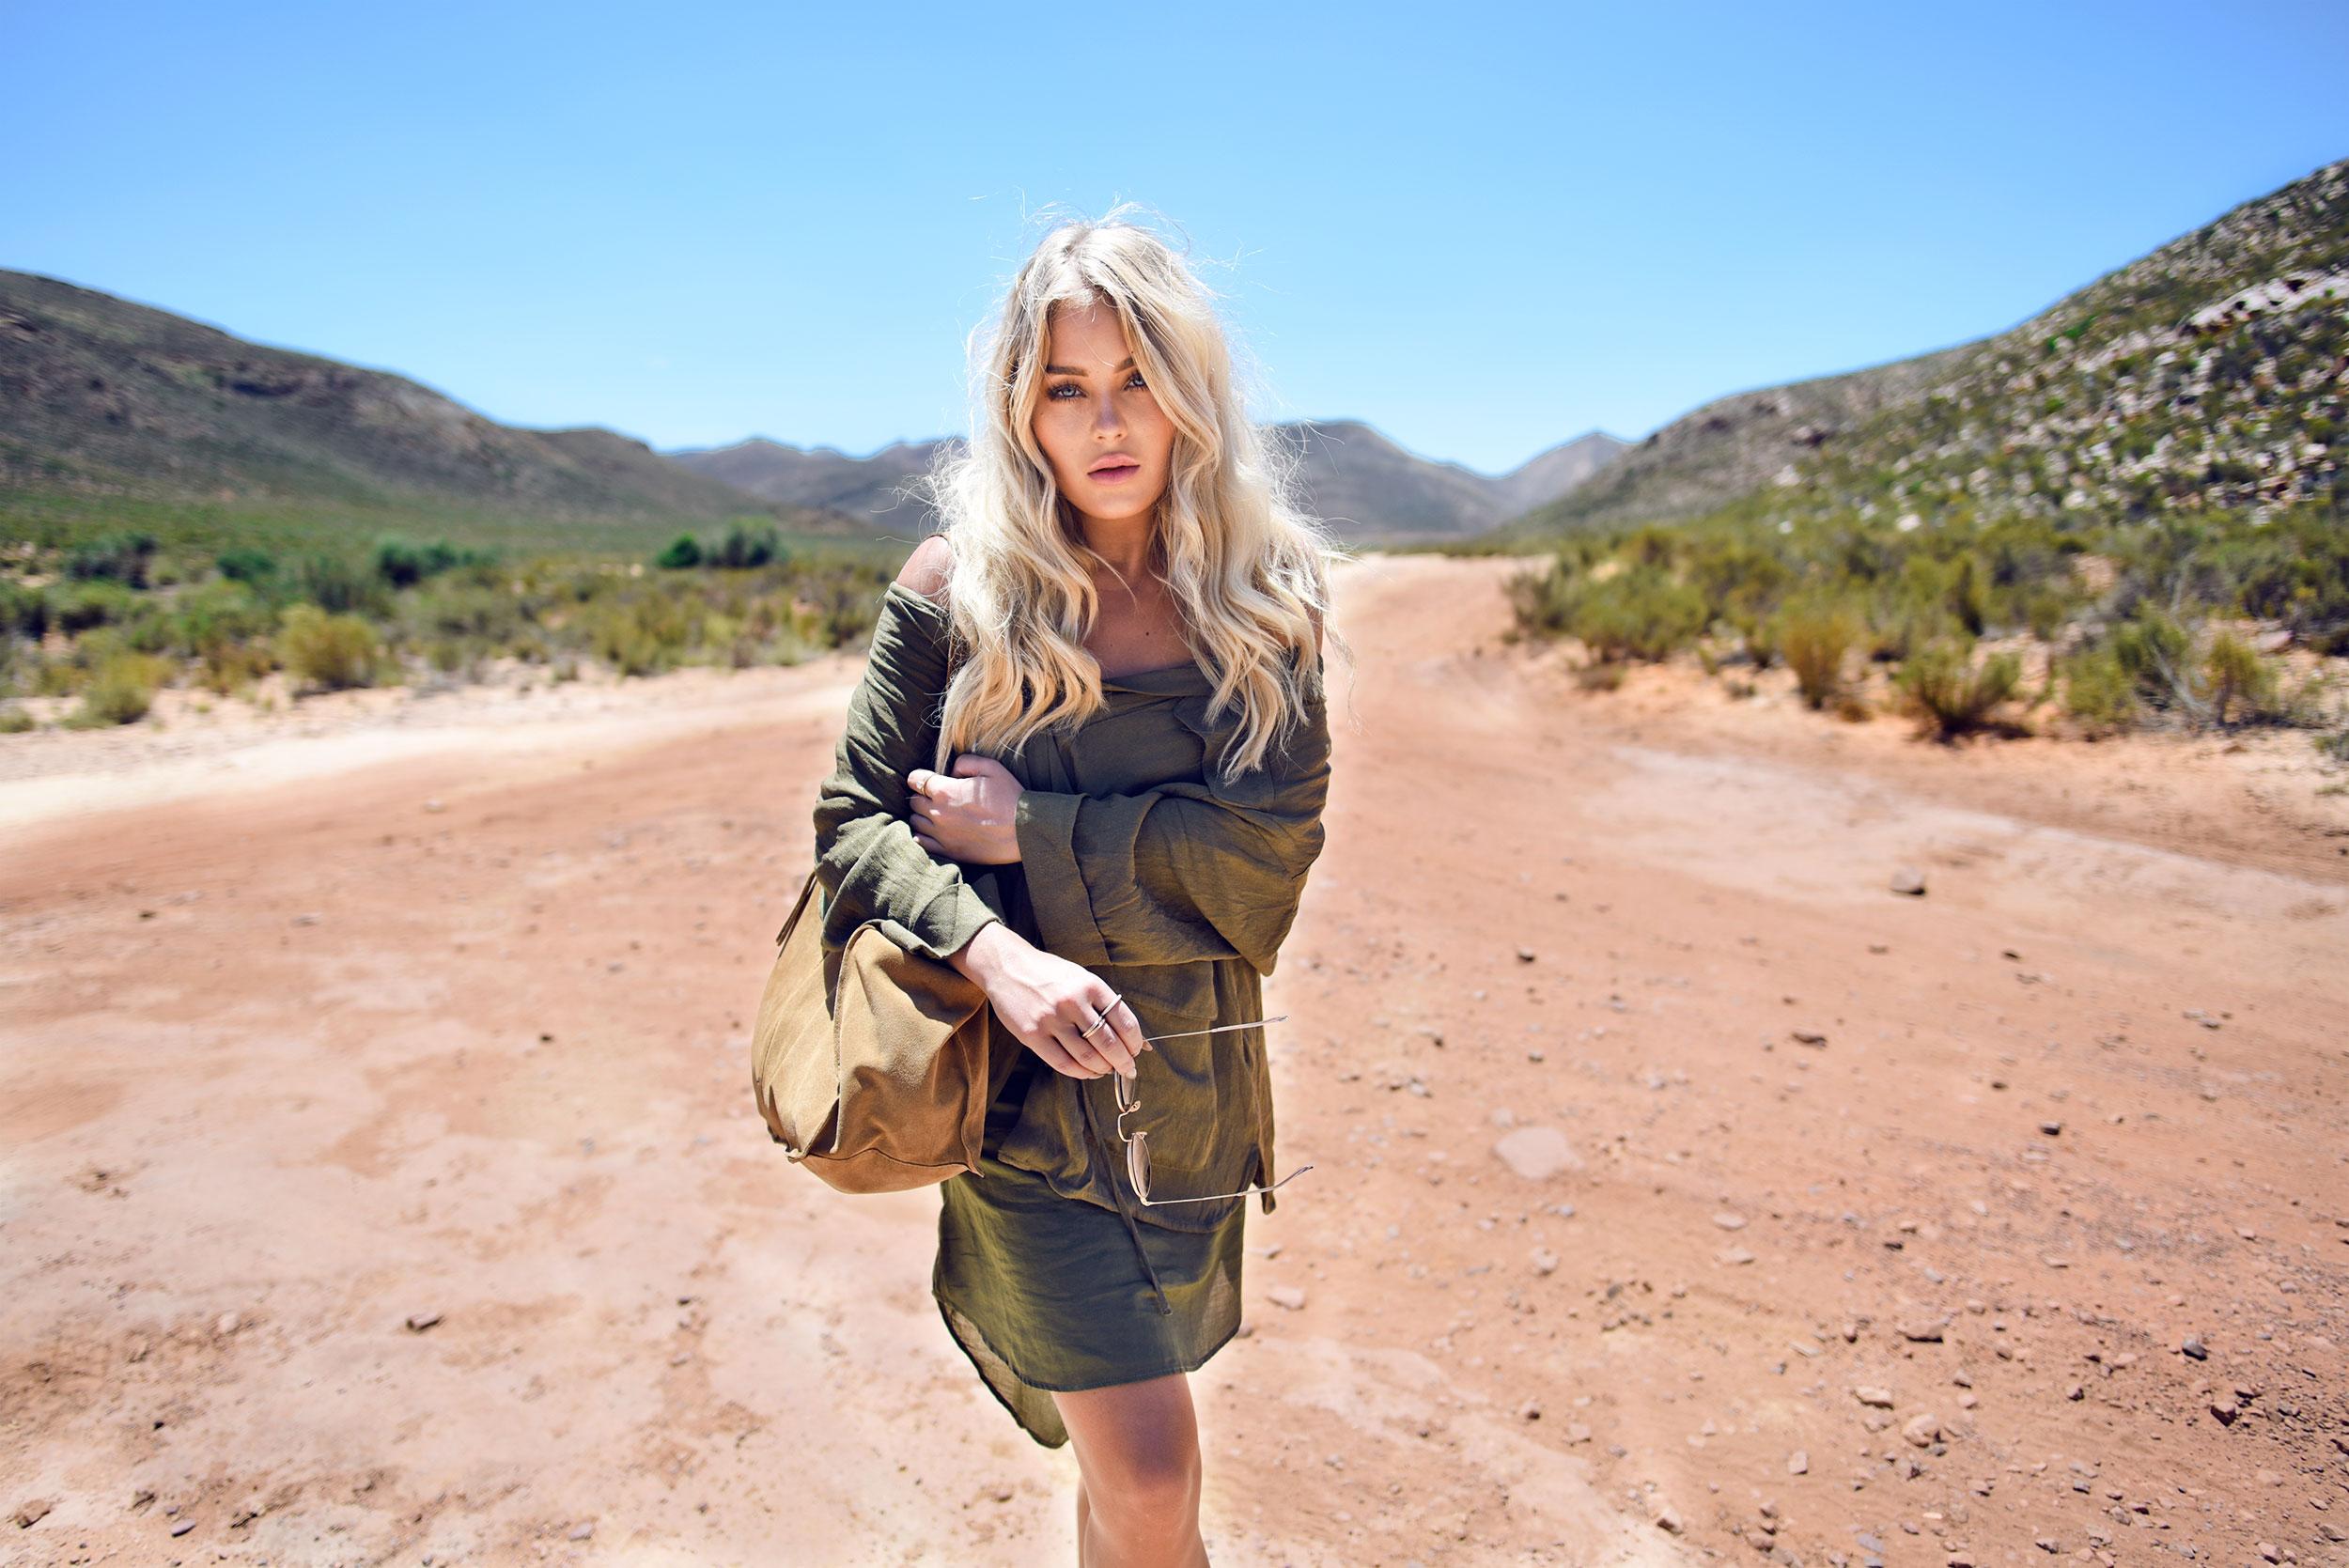 safari_angelicablick1